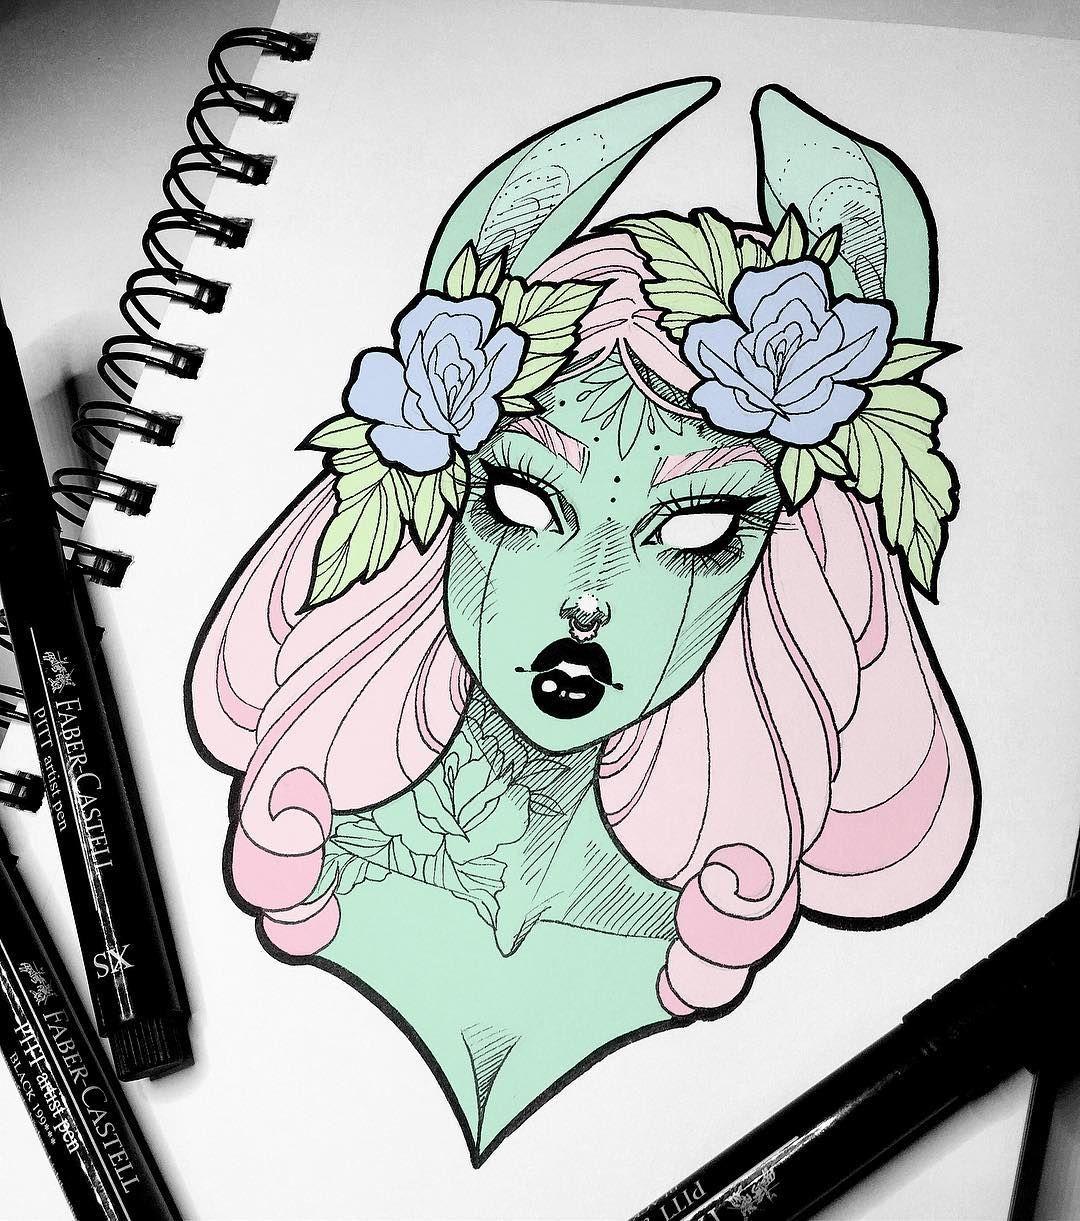 1080x1221 Pin By Neon Noir On Illustration Instagram